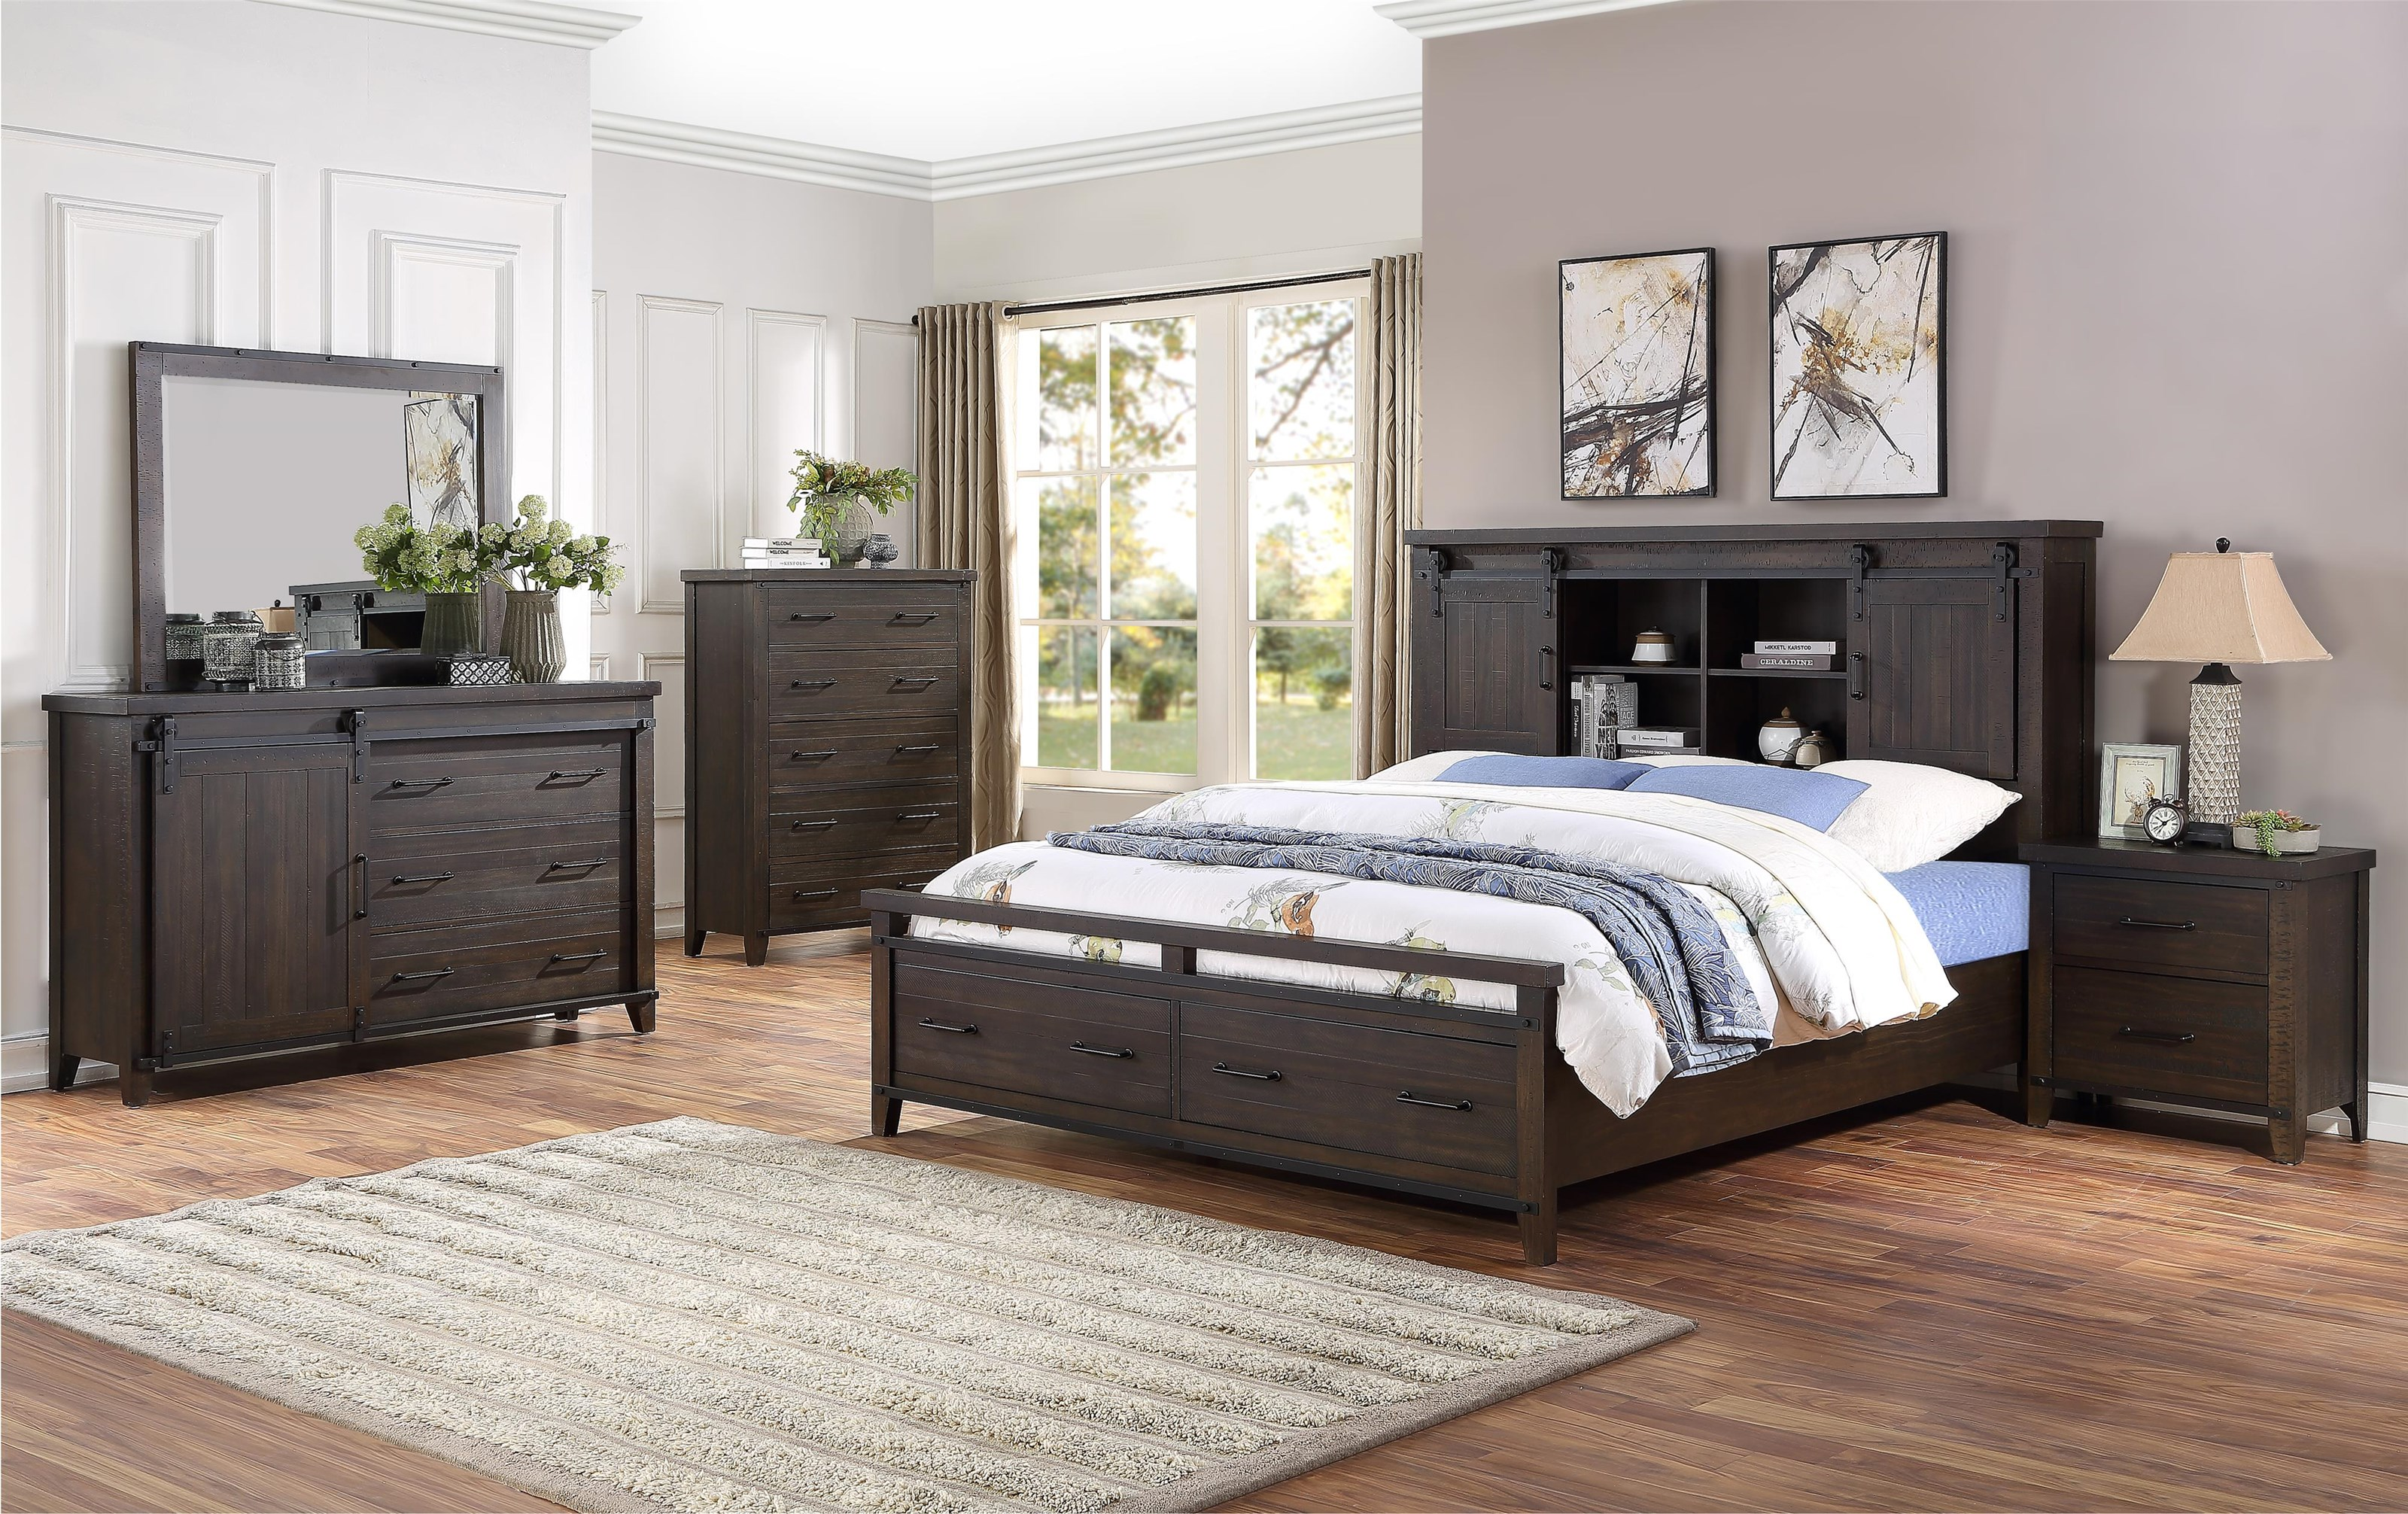 5 Piece King Storage Bedroom Group